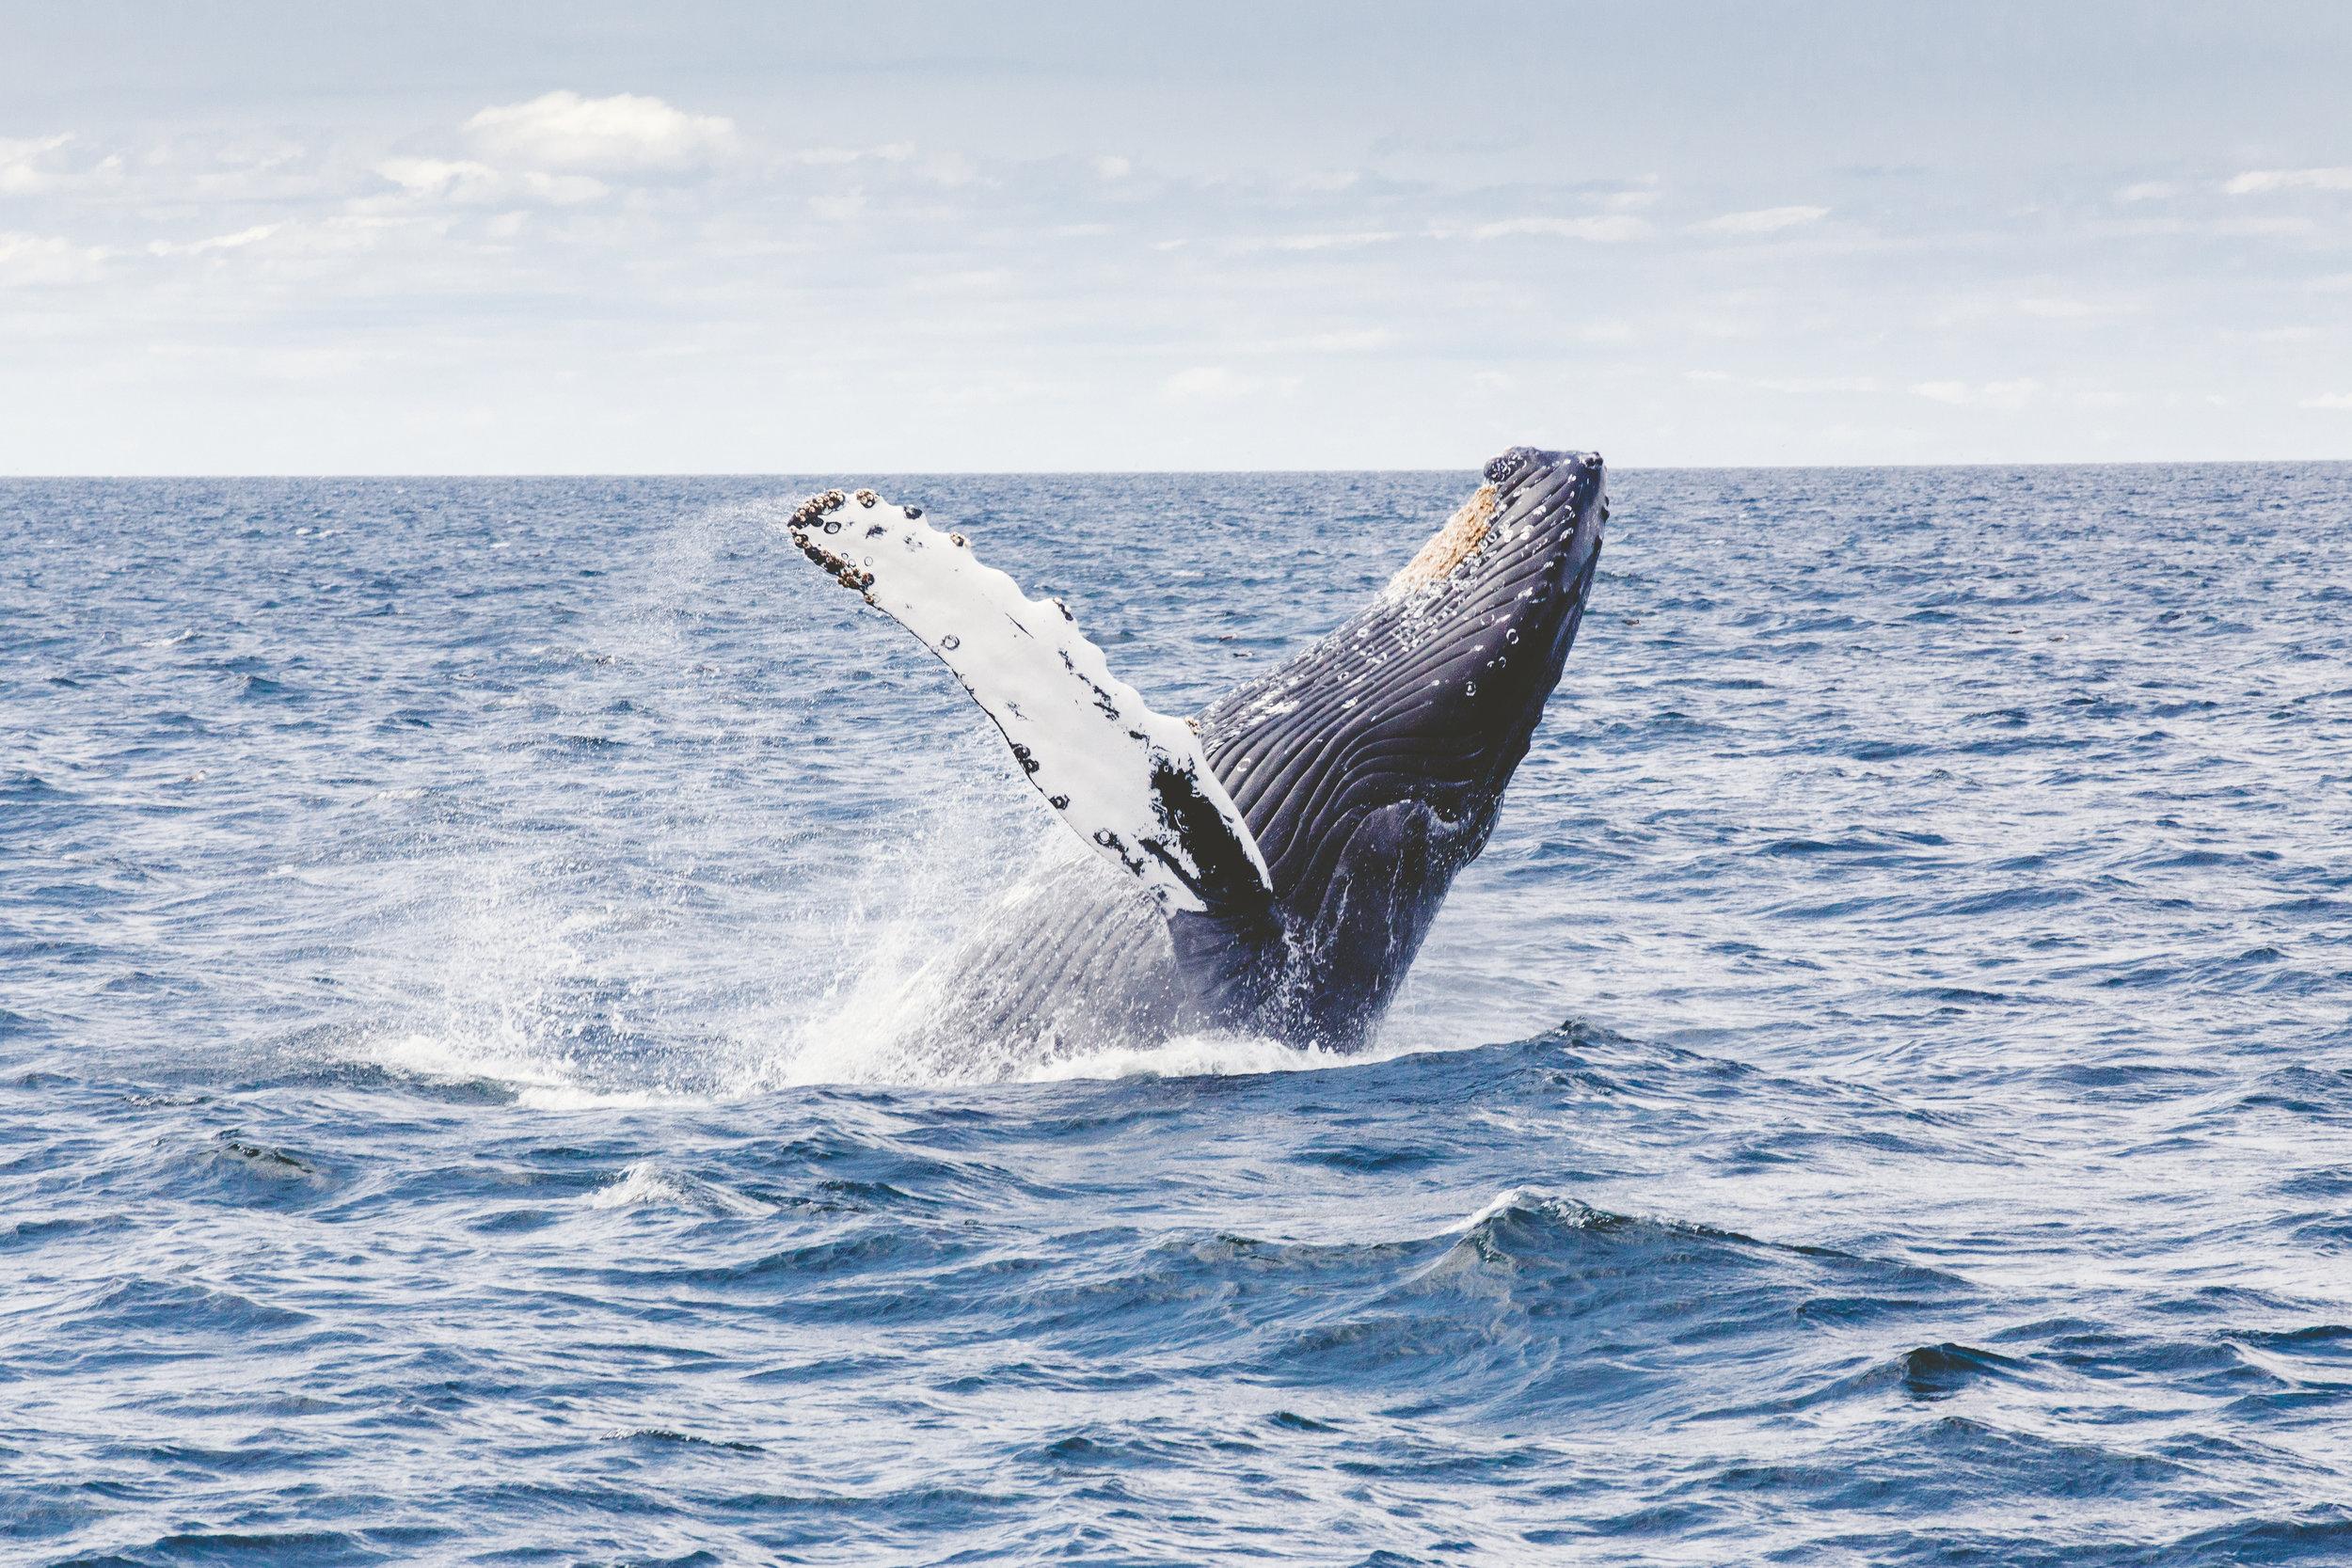 Humpback whales off the coast of Itacaré, Brazil (ETIV do Brasil Eco-Adventures)